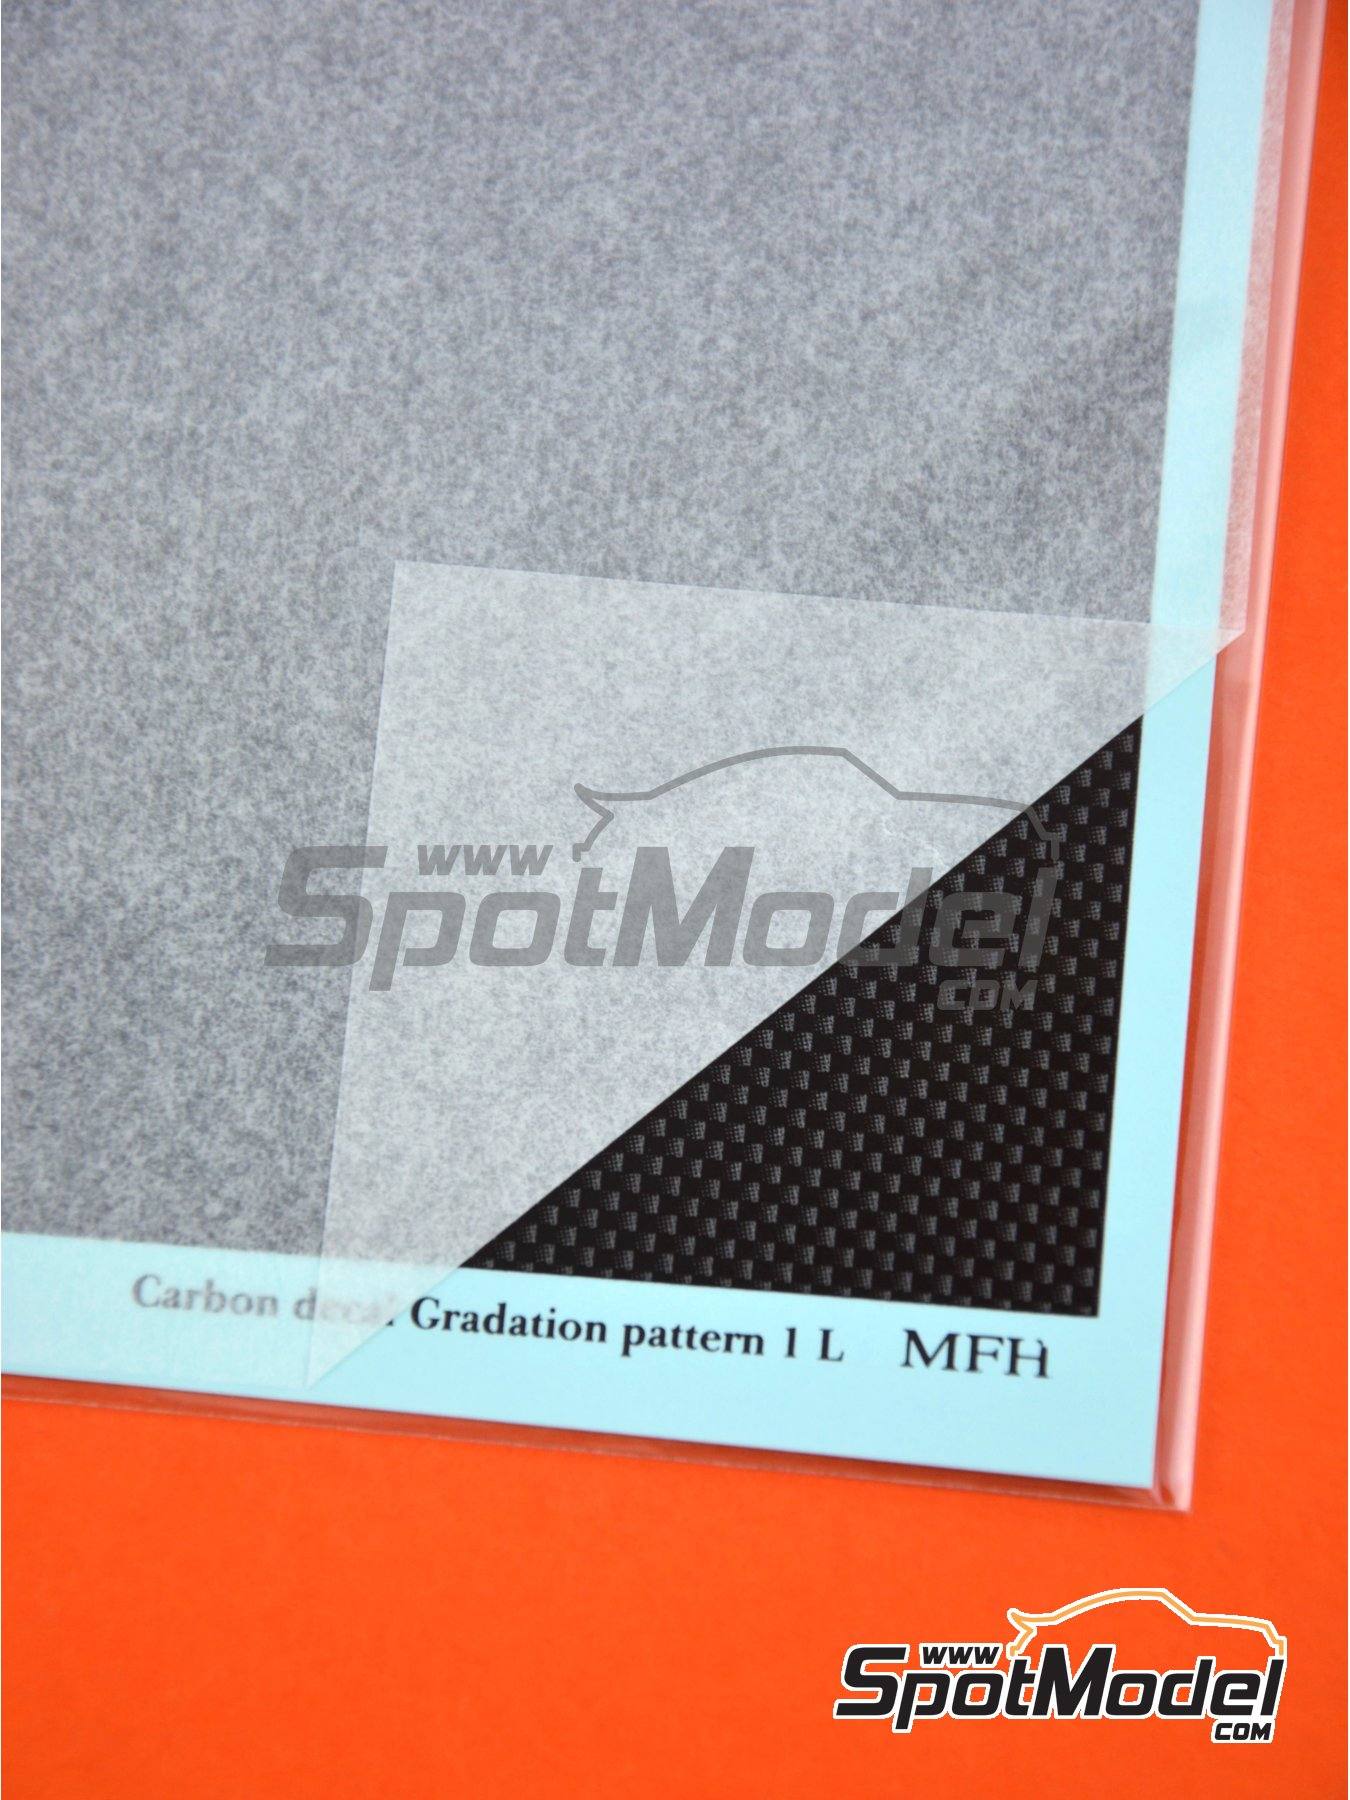 Fibra de carbono con trama de tipo 1 de tamaño grande | Calcas de agua fabricado por Model Factory Hiro (ref.MFH-P1134) image